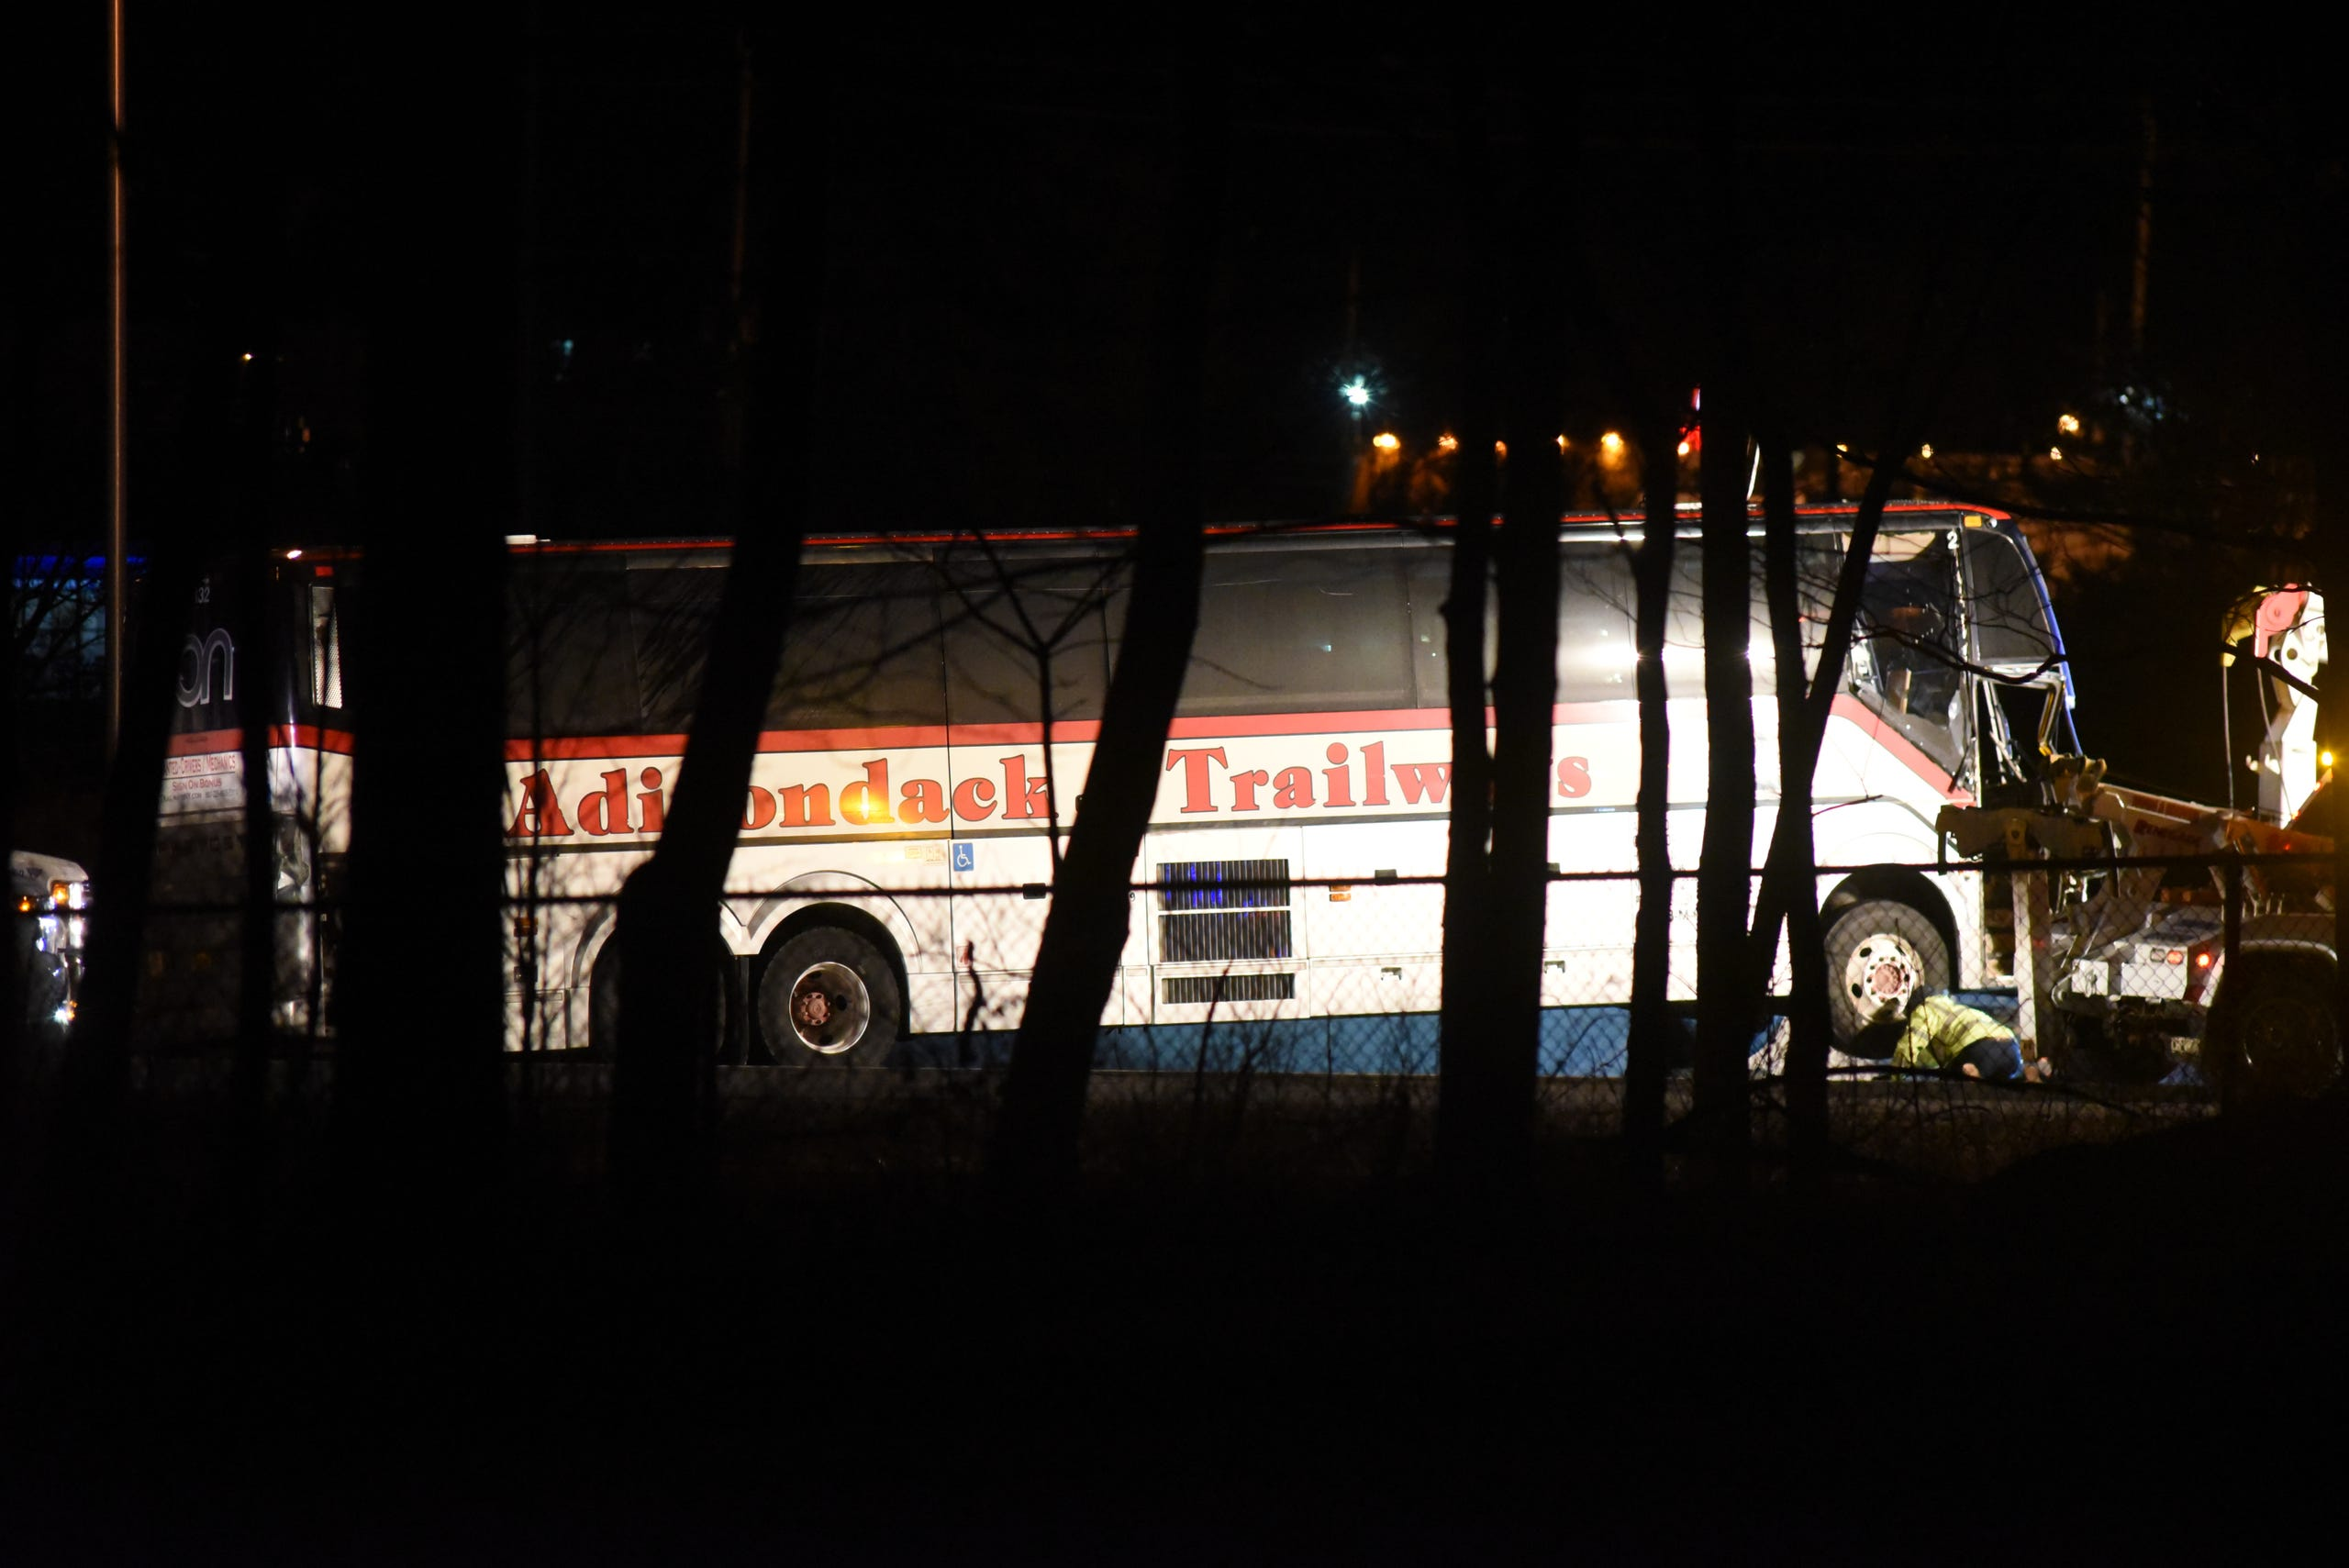 Route 80 crash kills 1, injures 20